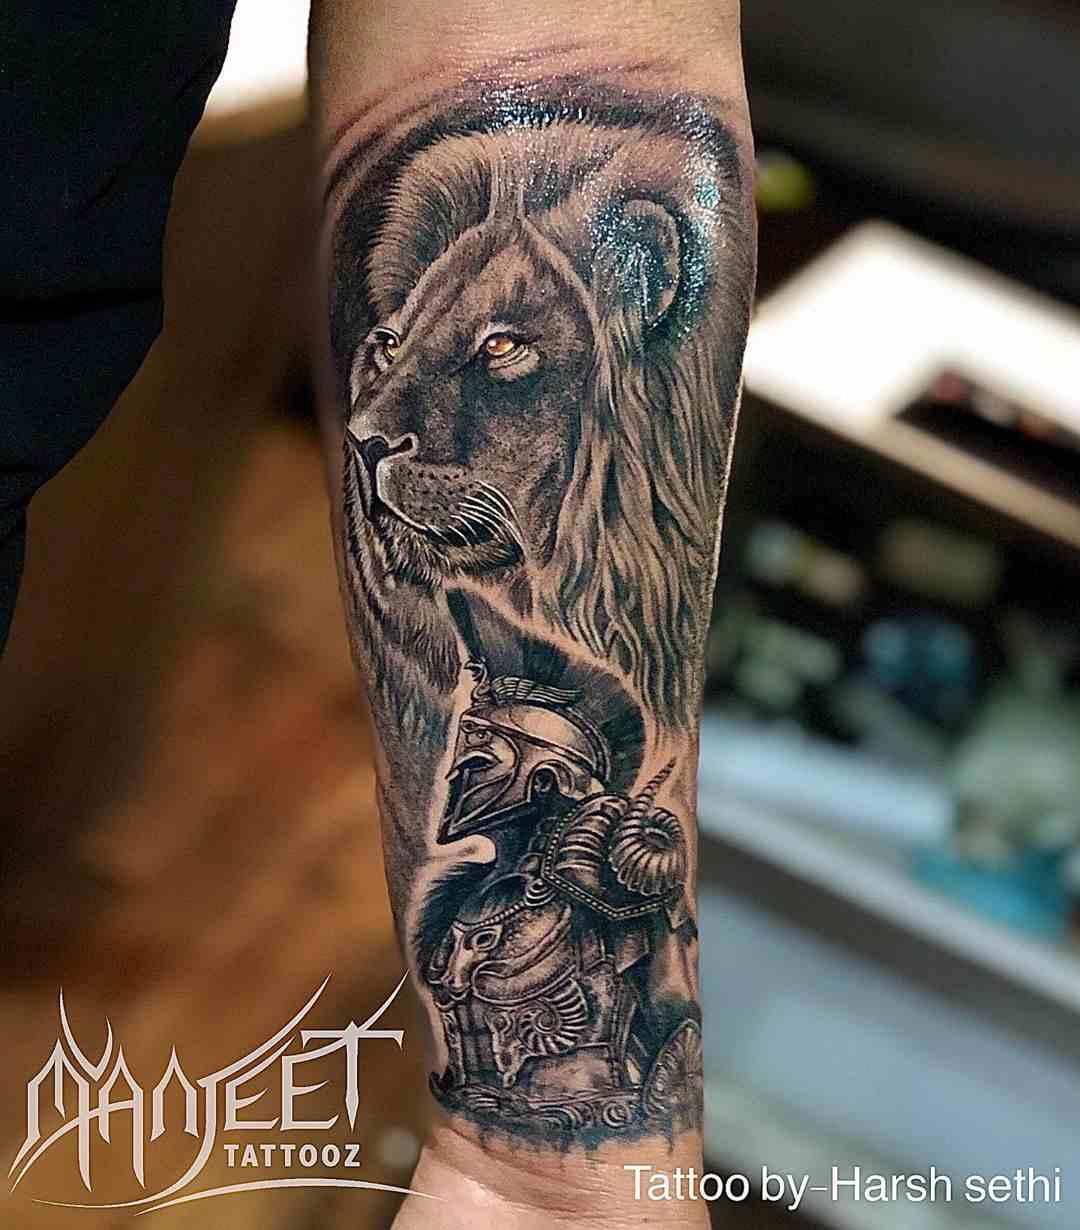 manjeet-tattooz-delhi-full-hand-lion-warrior